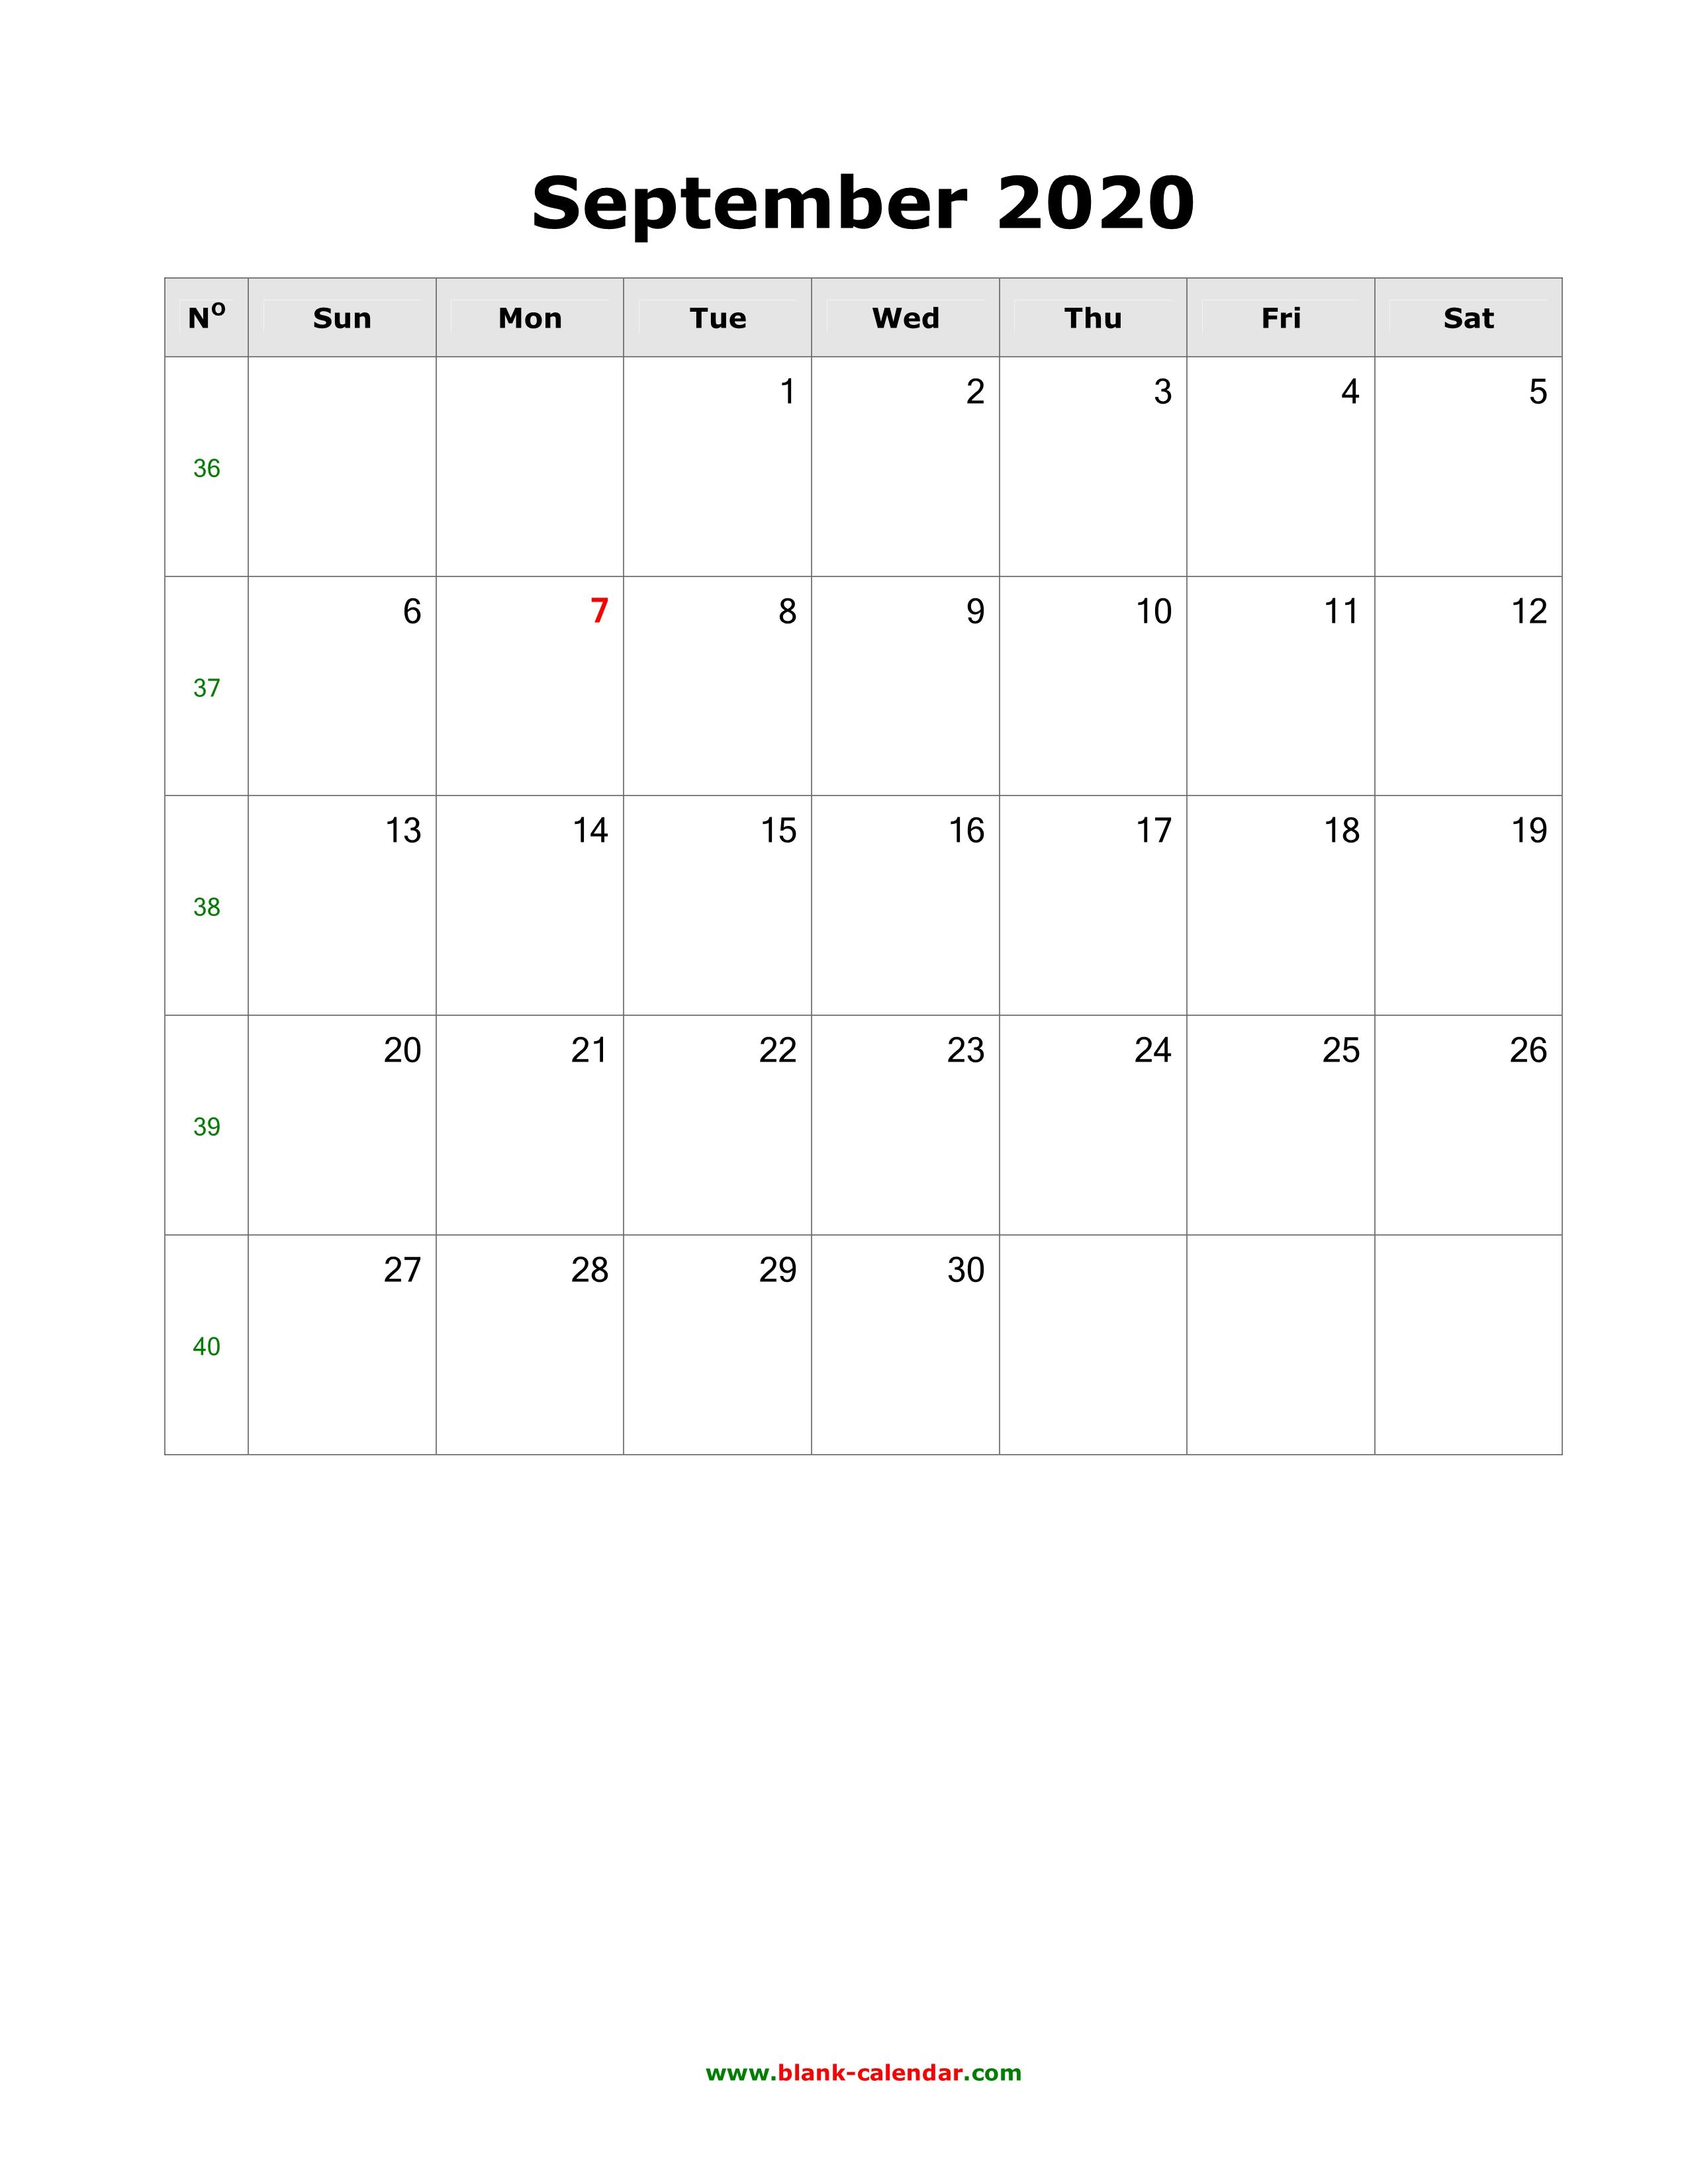 Download September 2020 Blank Calendar Vertical